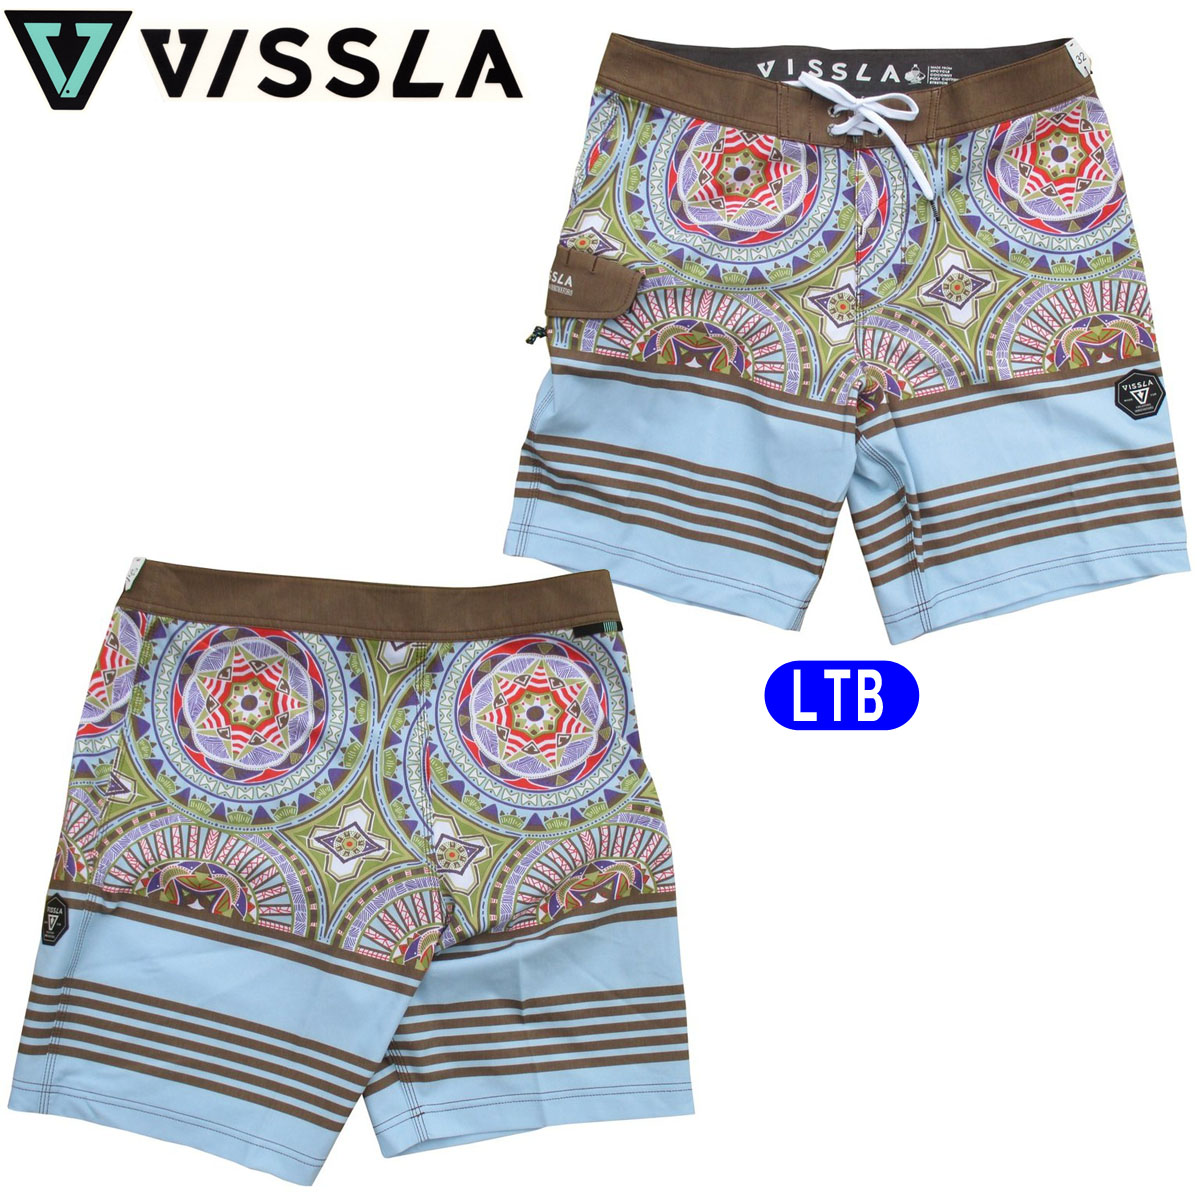 【VISSLA(ヴィスラ)】ボードショーツ 海パン 水着 品番:M1048SUI16SP 即日出荷 日本正規品 メール便(送料無料)